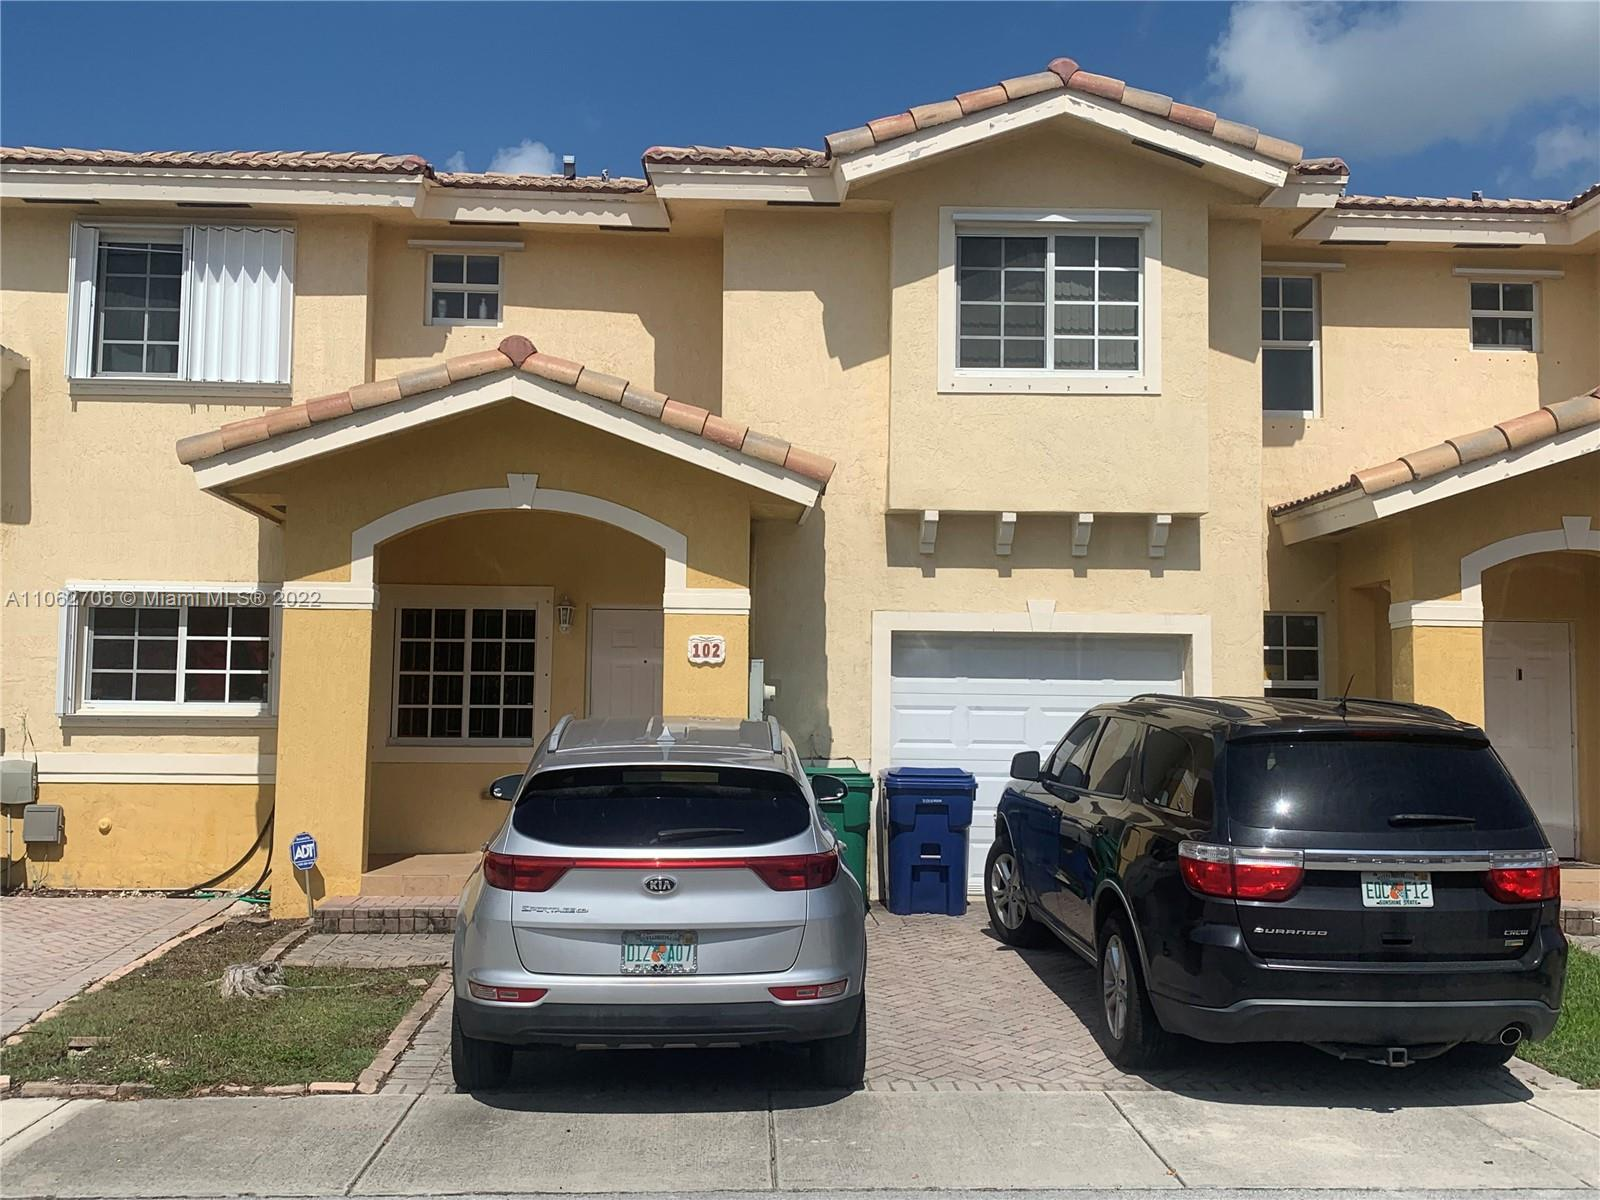 13982 Sw 260th St 102 Property Photo 1